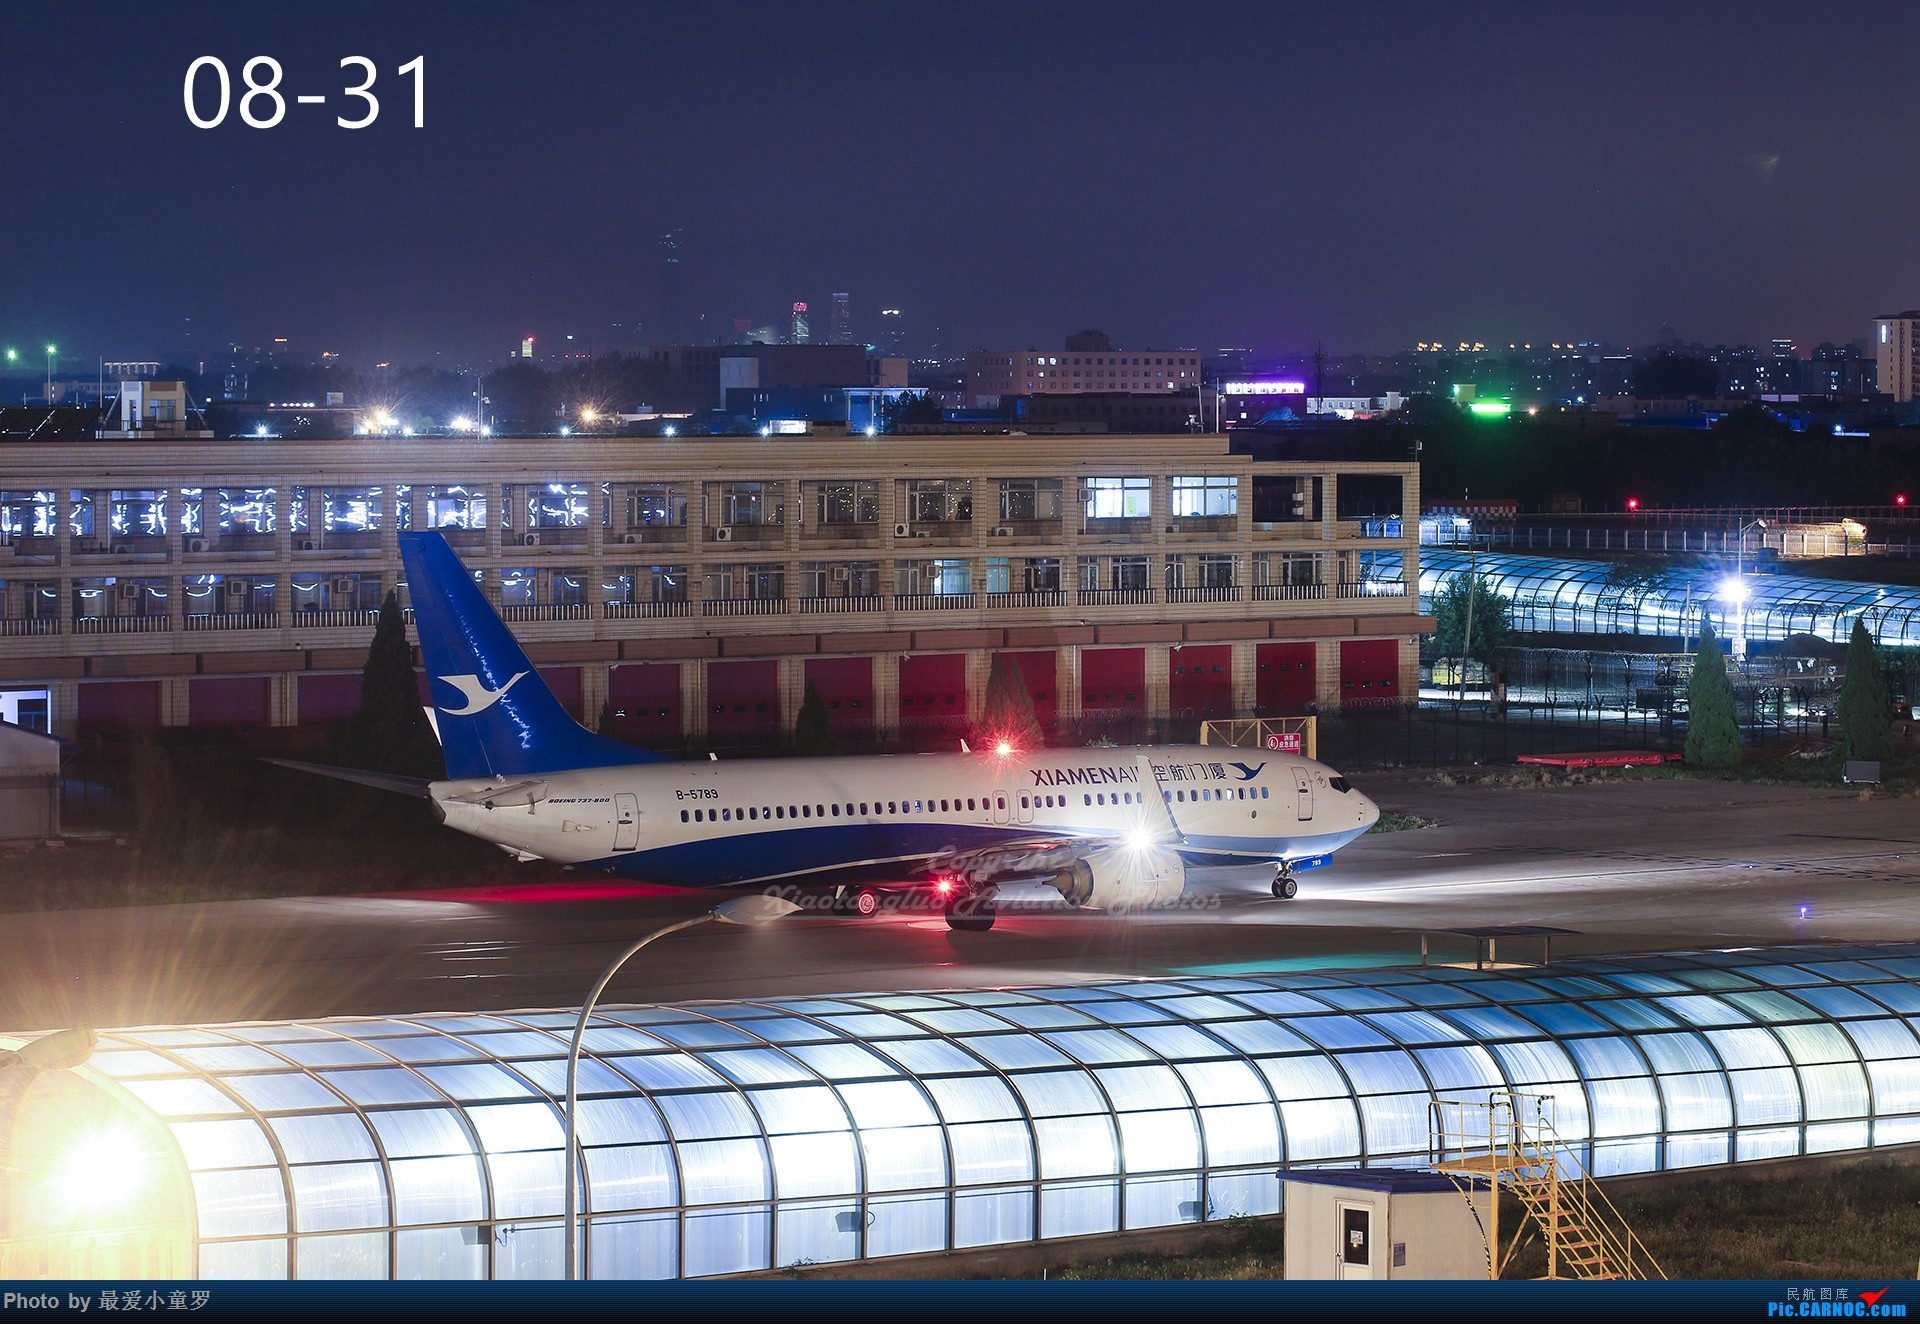 Re:[原创]年底交作业——小童罗的2018年拍机总结 BOEING 737-800 B-5789 中国北京首都国际机场